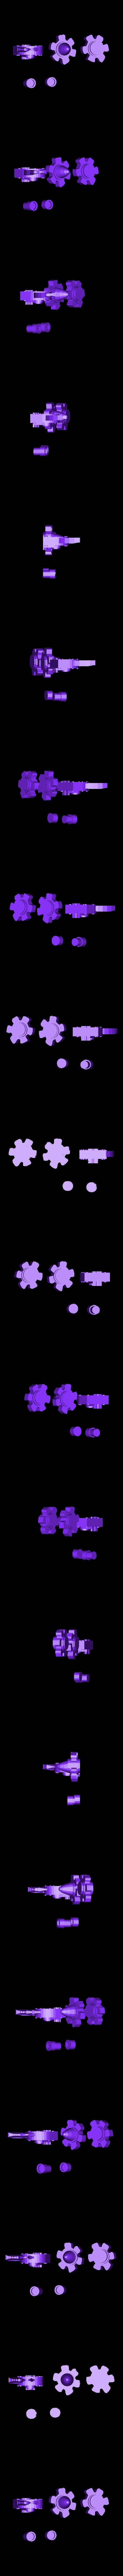 copter_small_parts.stl Download free STL file dwarf gyrocopter • 3D printer design, mrhers2